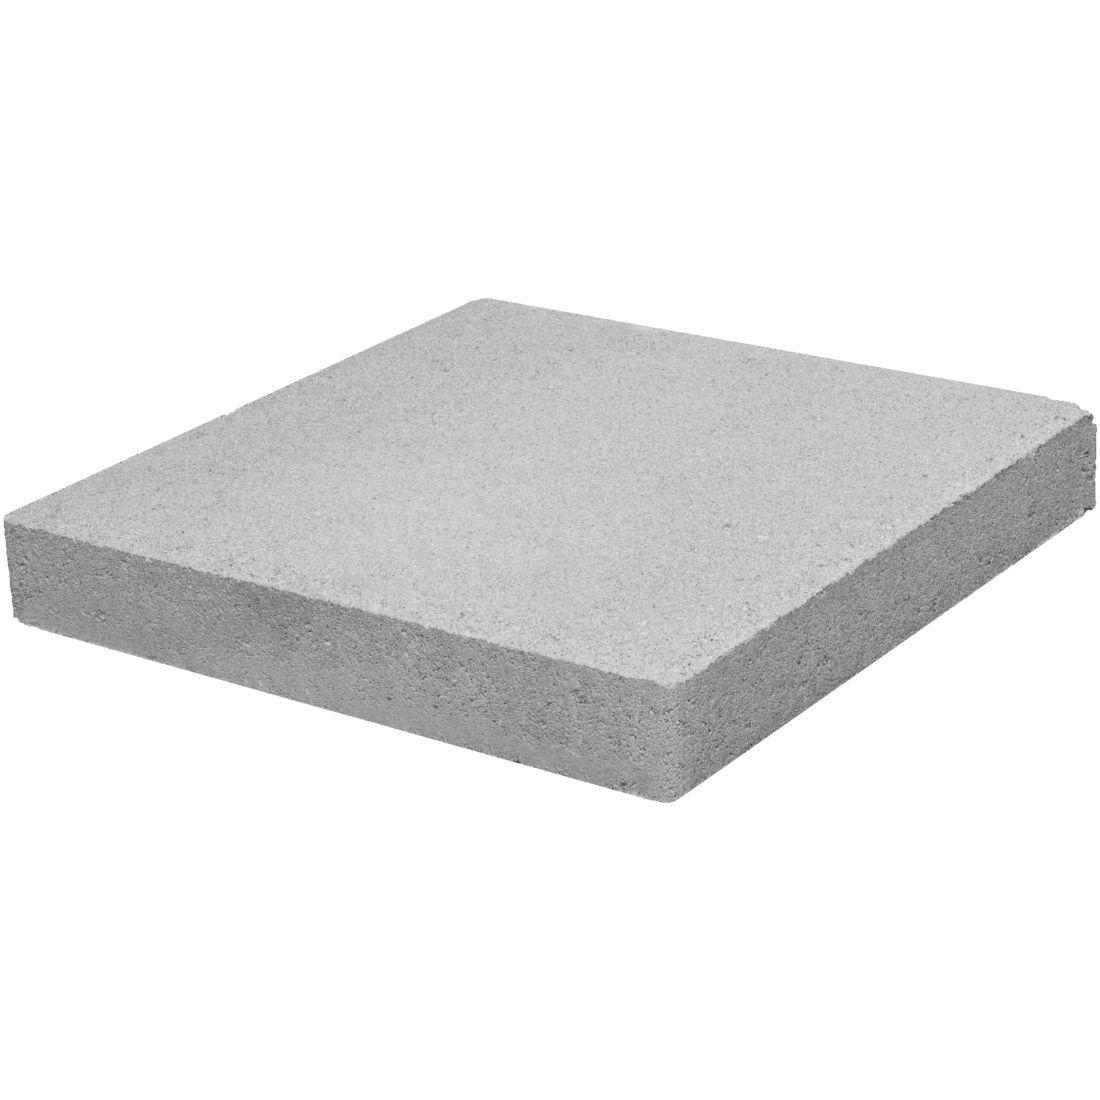 Flagstone Concrete Paver 400 x 400 x 40mm Ironstone